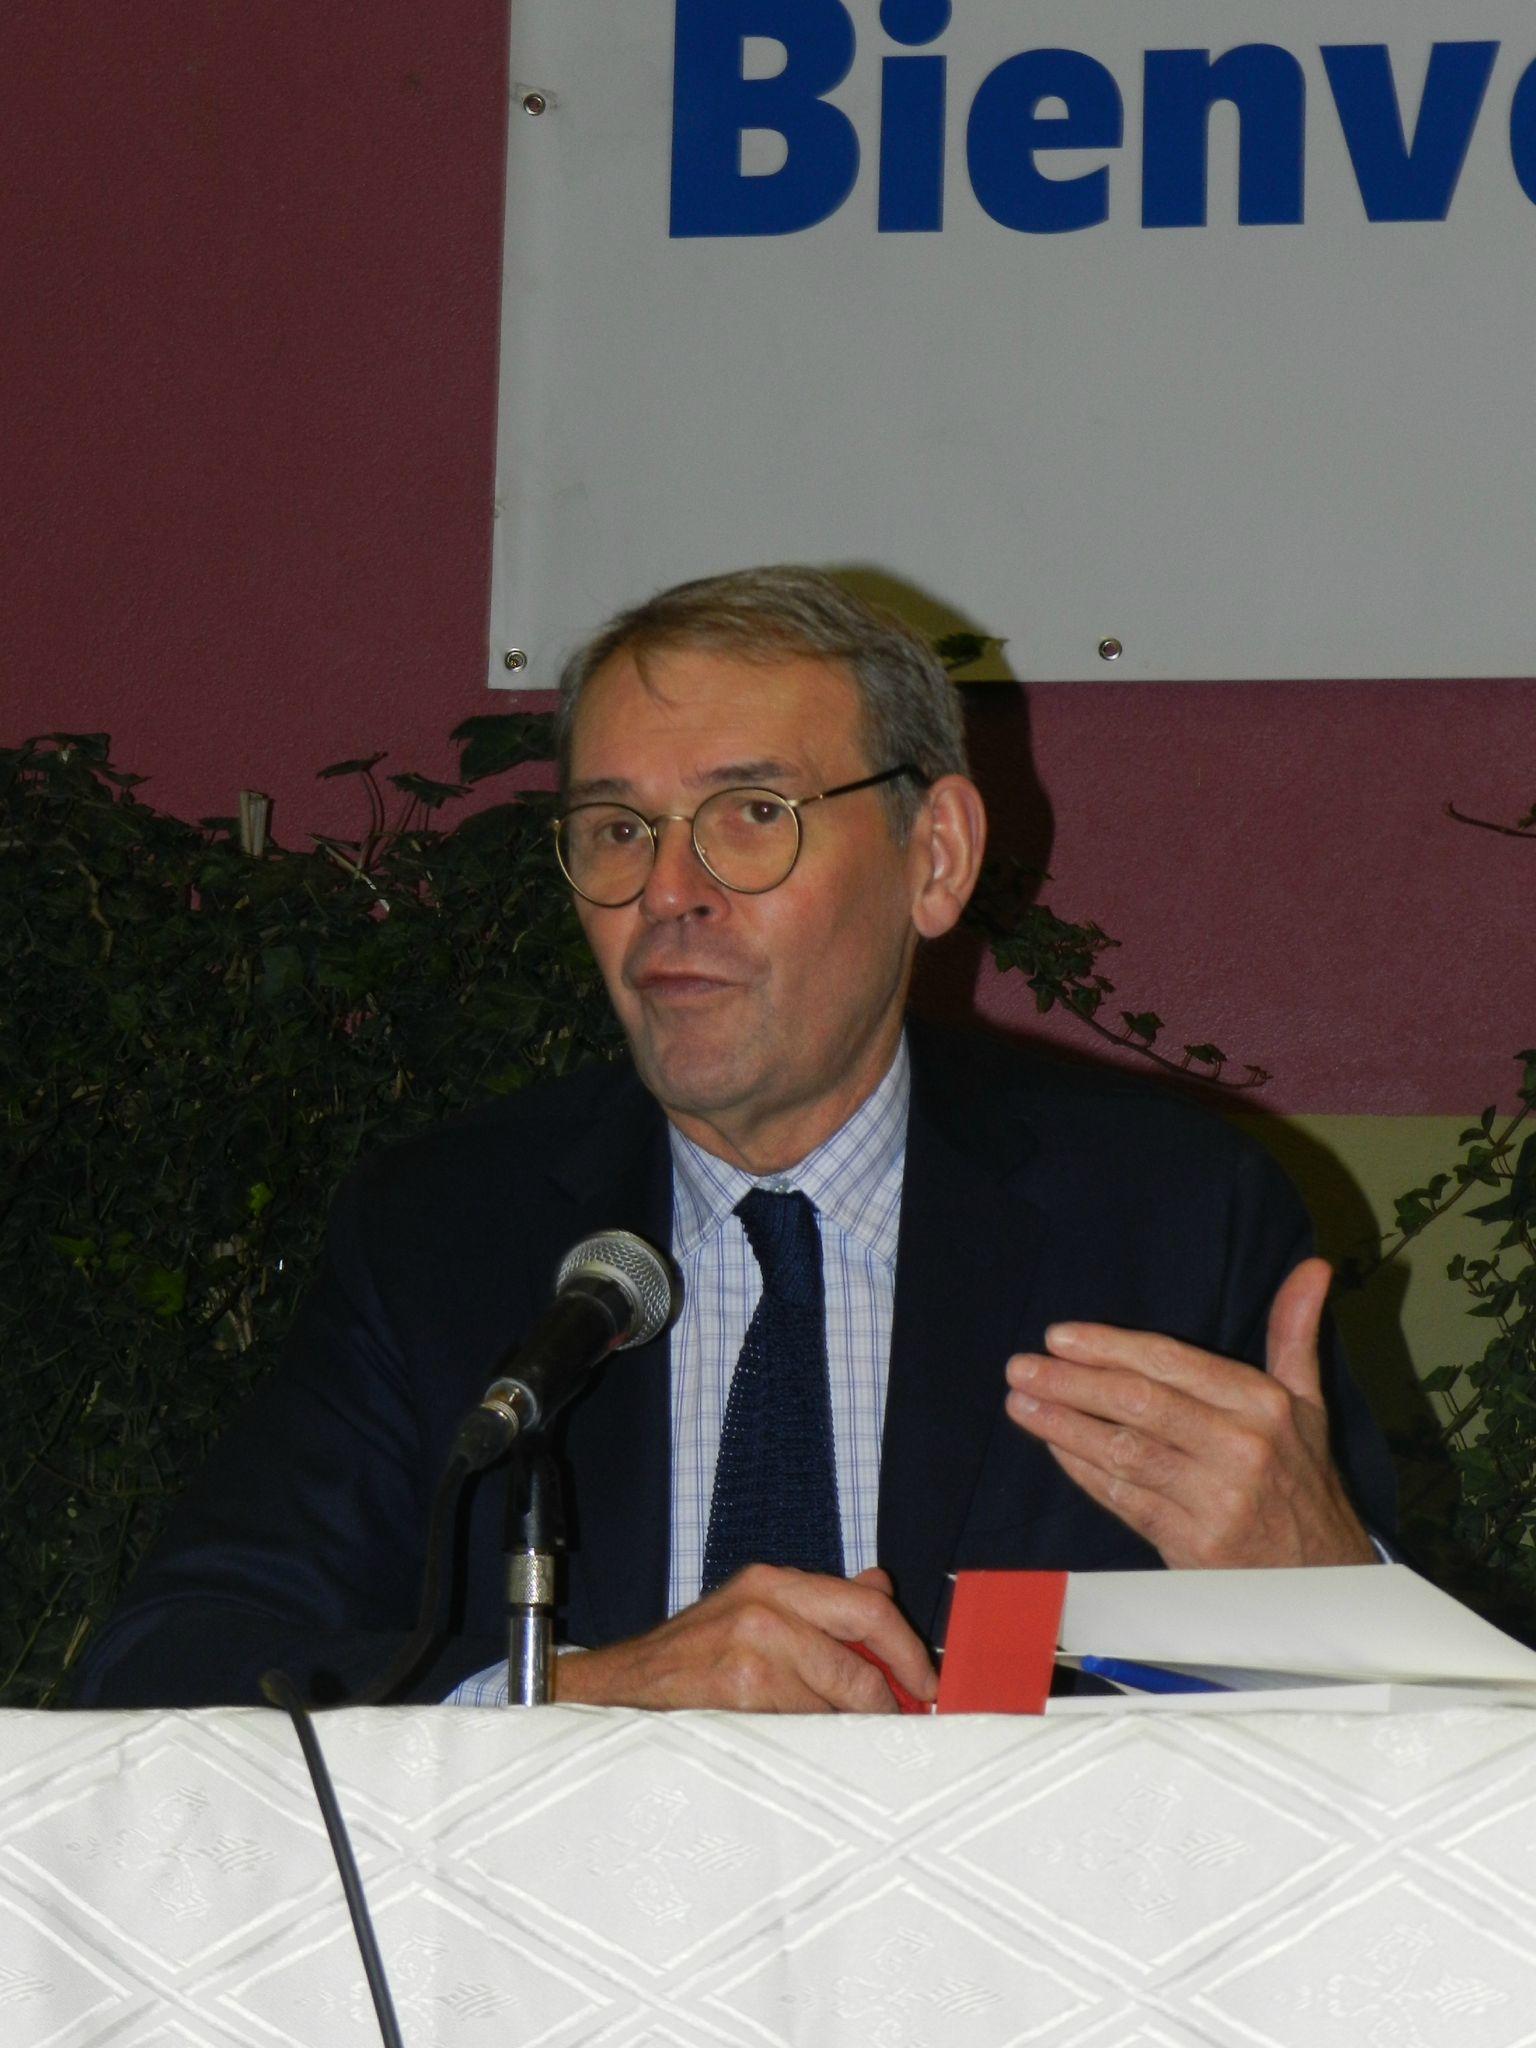 Jean-Jacques Aillagon pendant sa conférence